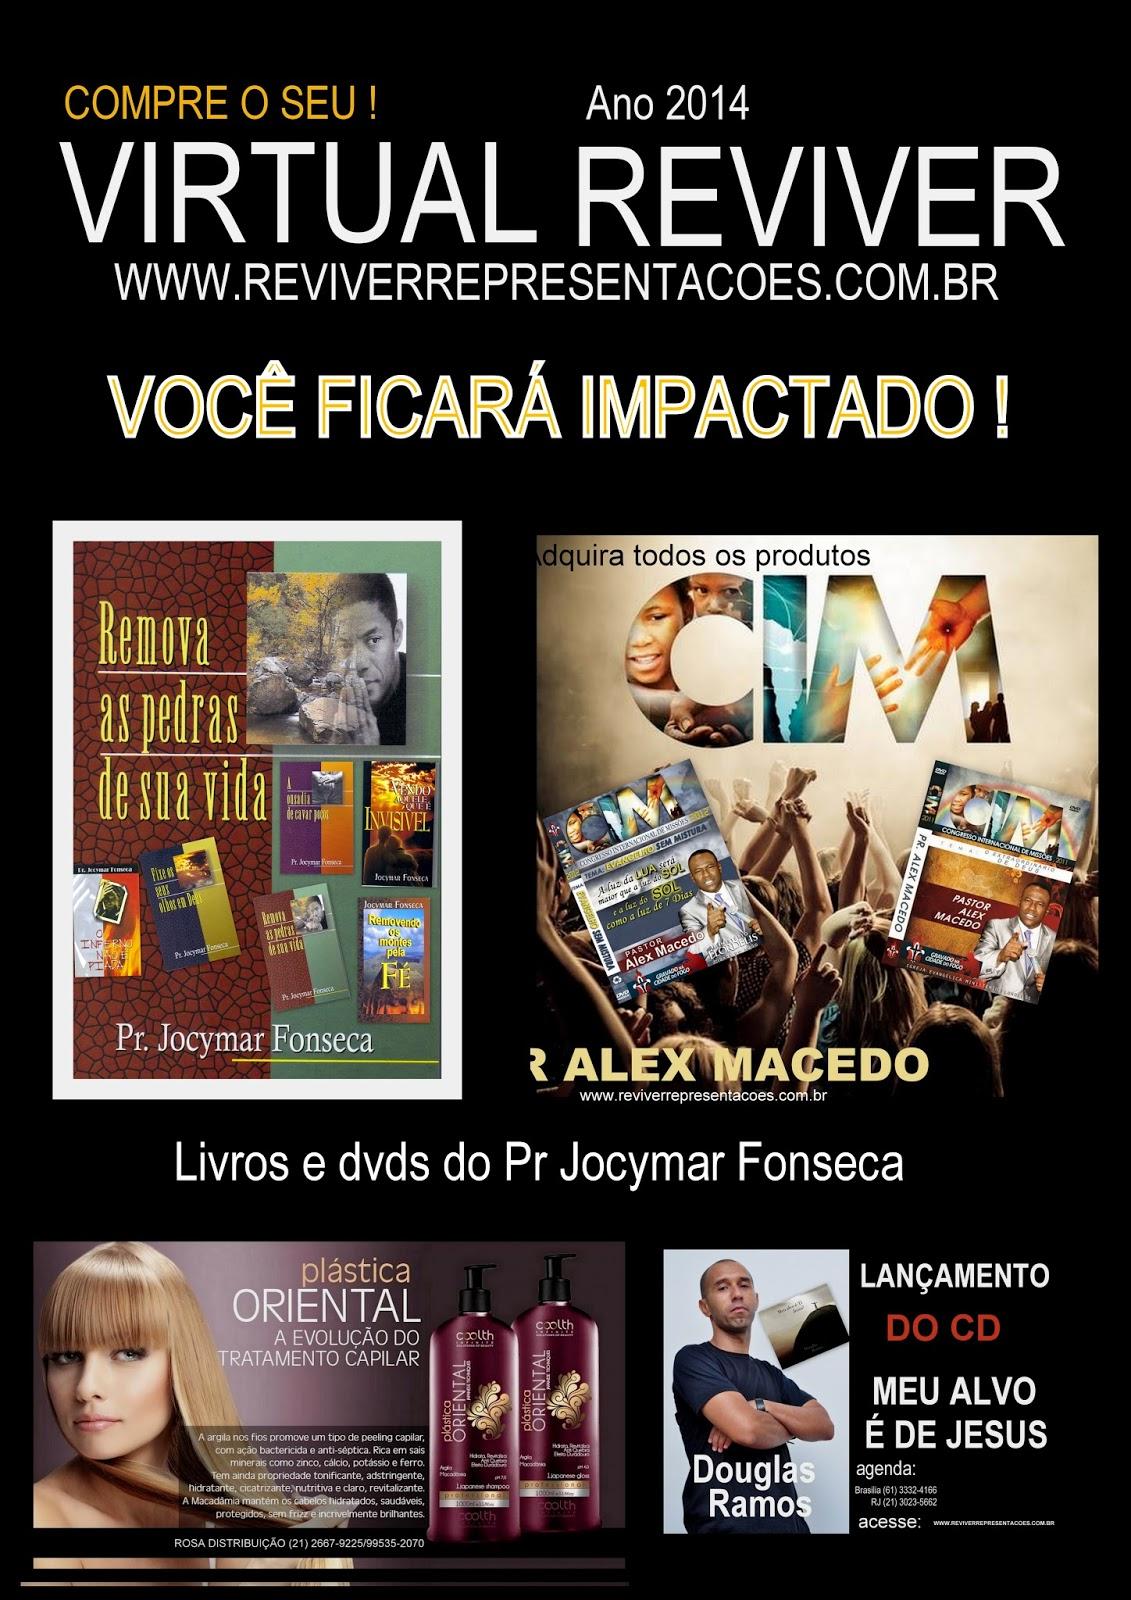 www.reviverrerepresentacoes.com.br